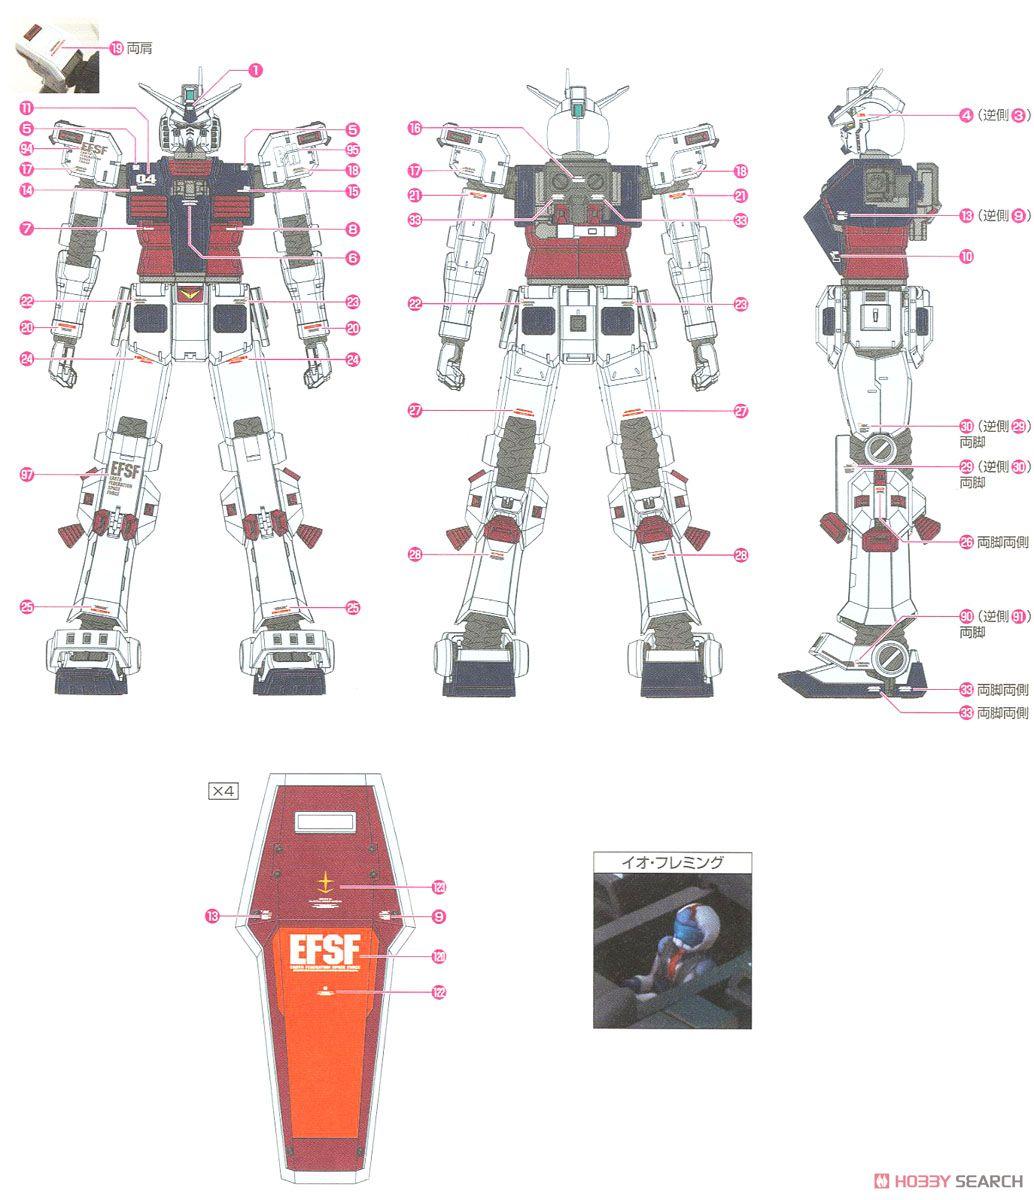 MG 1/100『フルアーマー・ガンダム Ver.Ka(GUNDAM THUNDERBOLT版)』機動戦士ガンダム サンダーボルト プラモデル-023